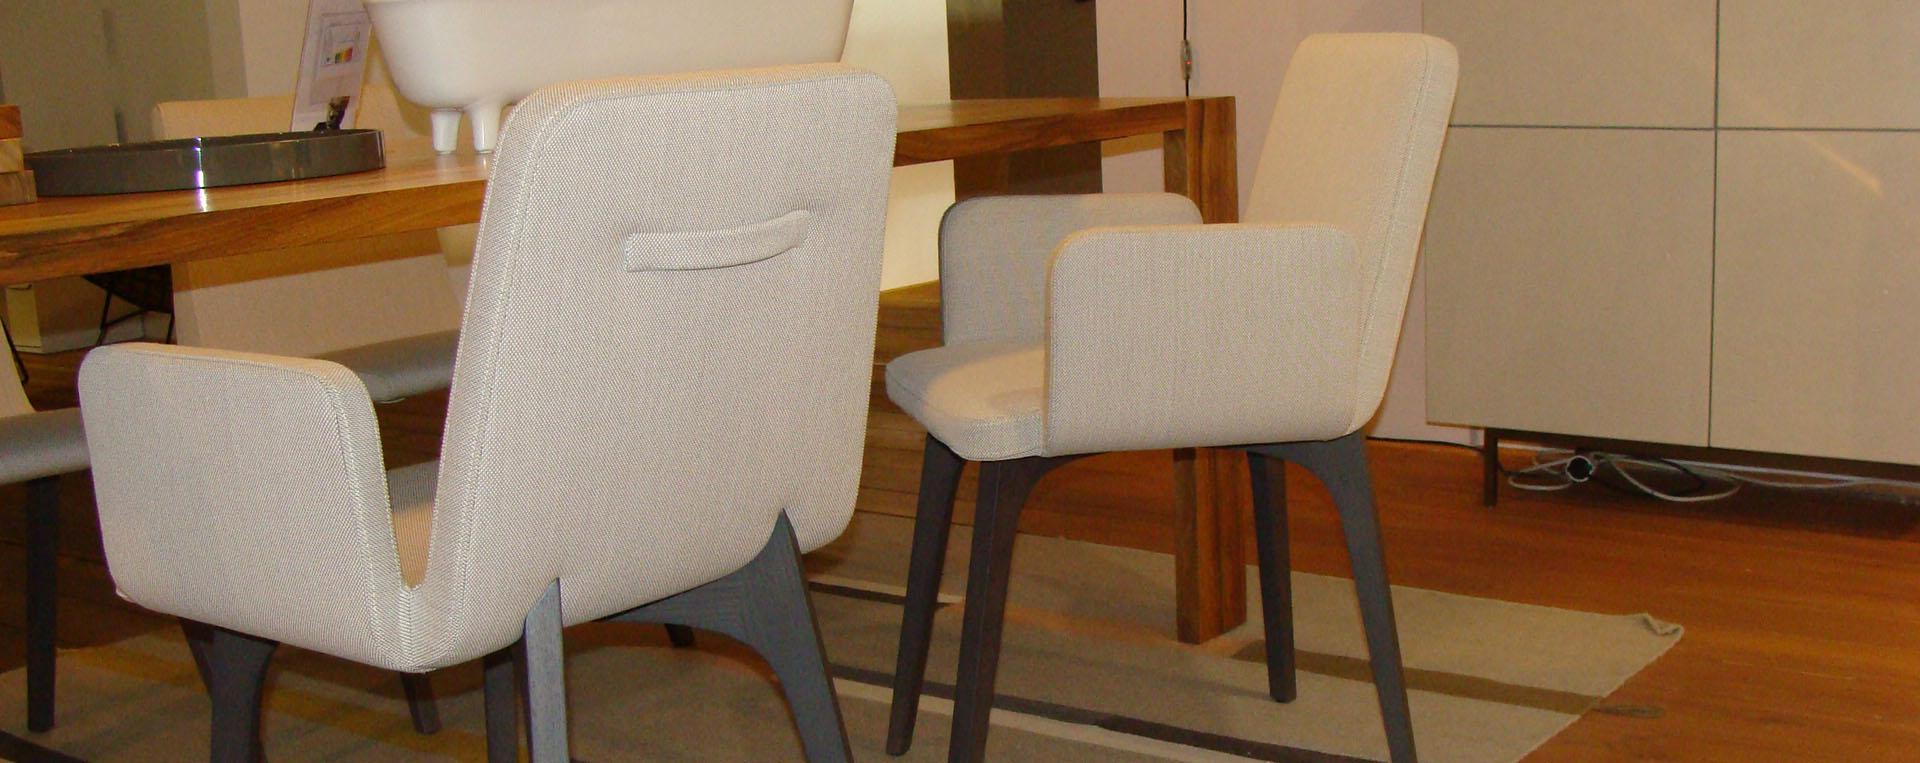 ligne roset preise schlafsofas ligne roset bei stylepark. Black Bedroom Furniture Sets. Home Design Ideas